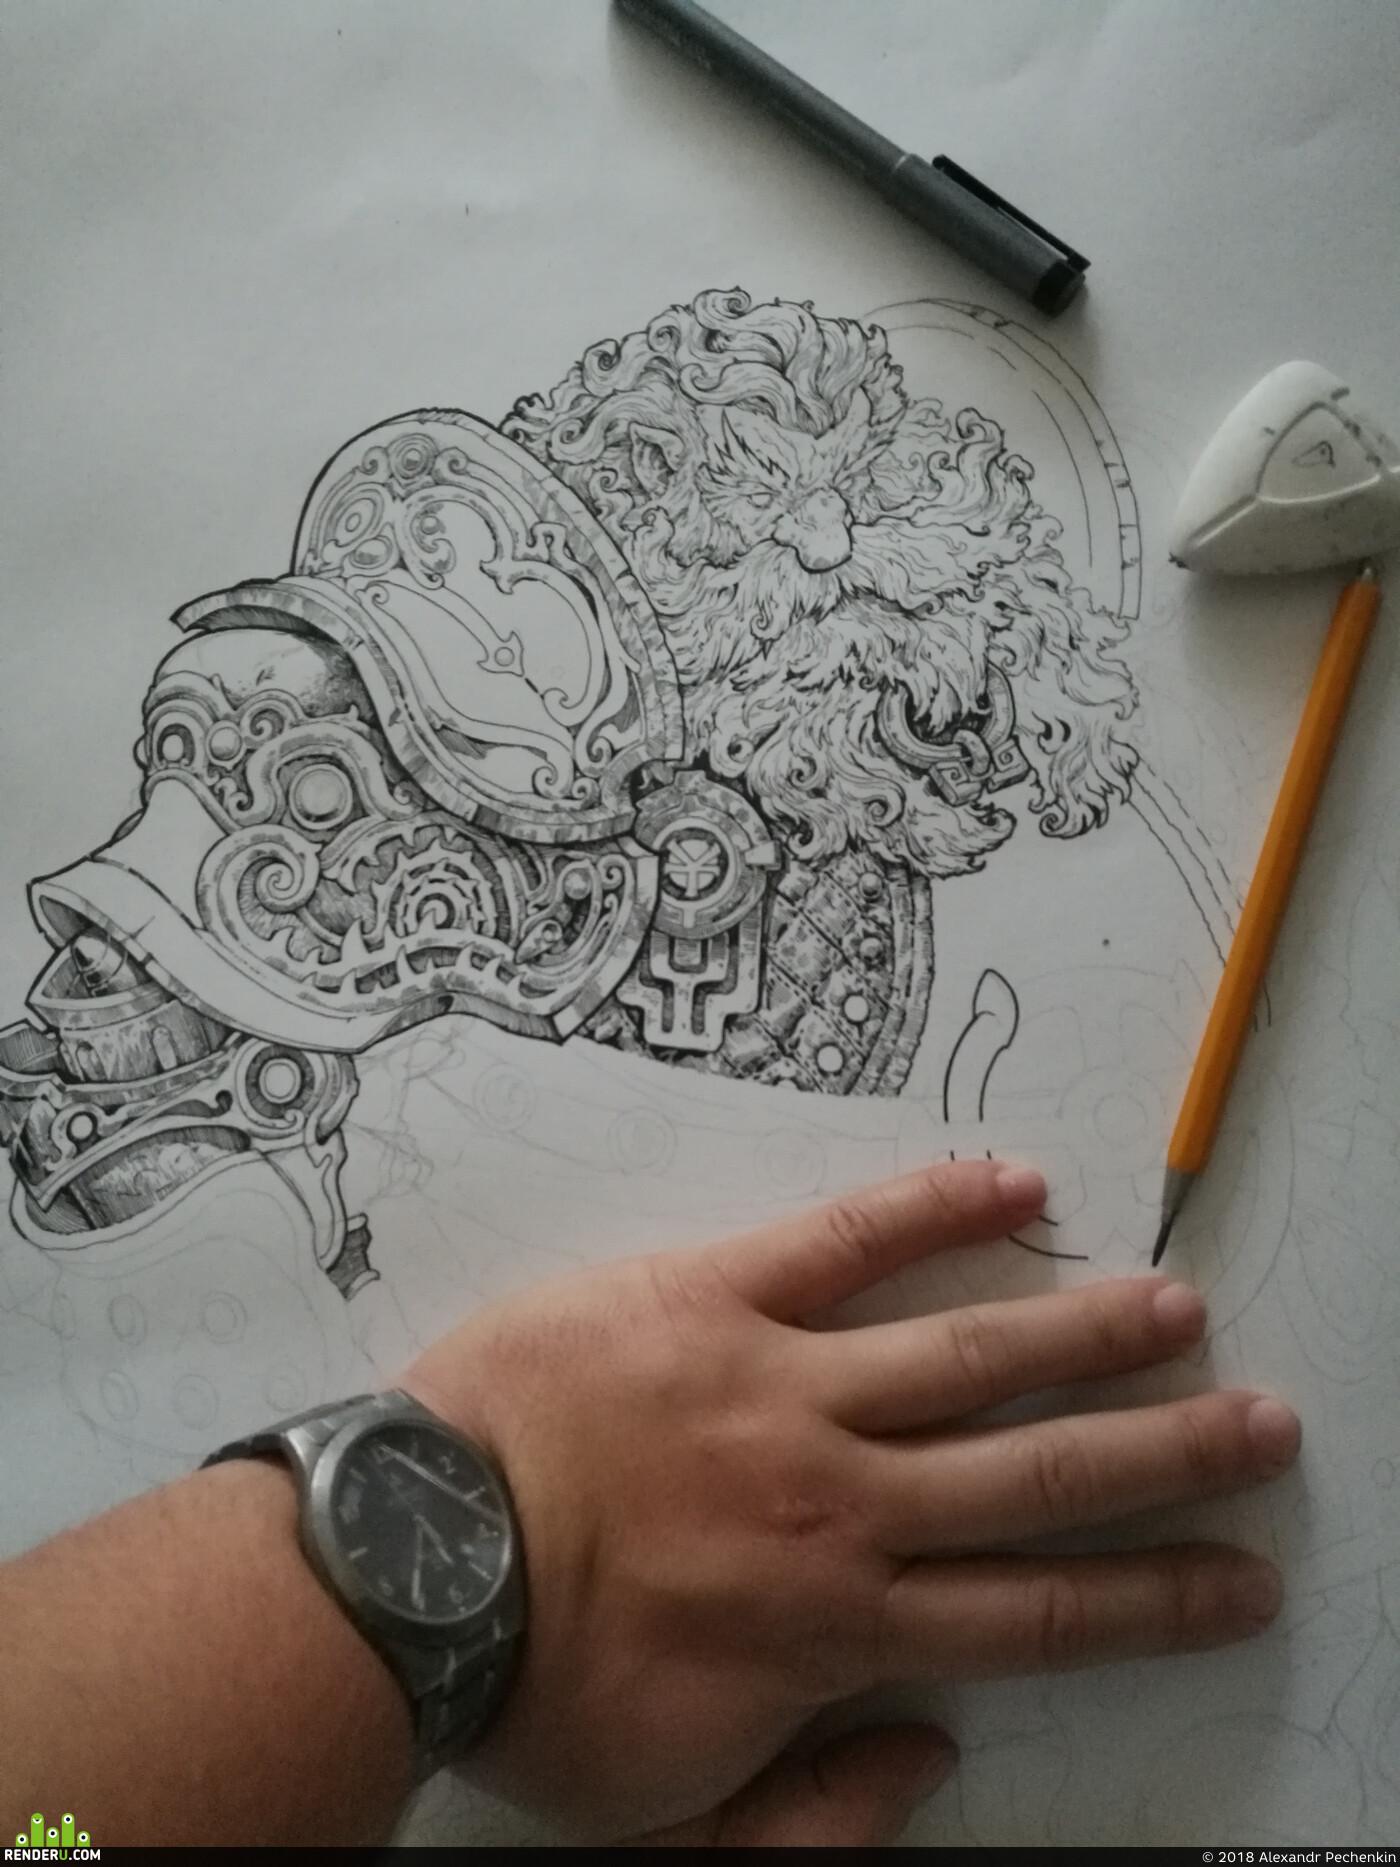 Littledruid, Картун (Cartoon), ConceptartistRPG, concept-art, inktober